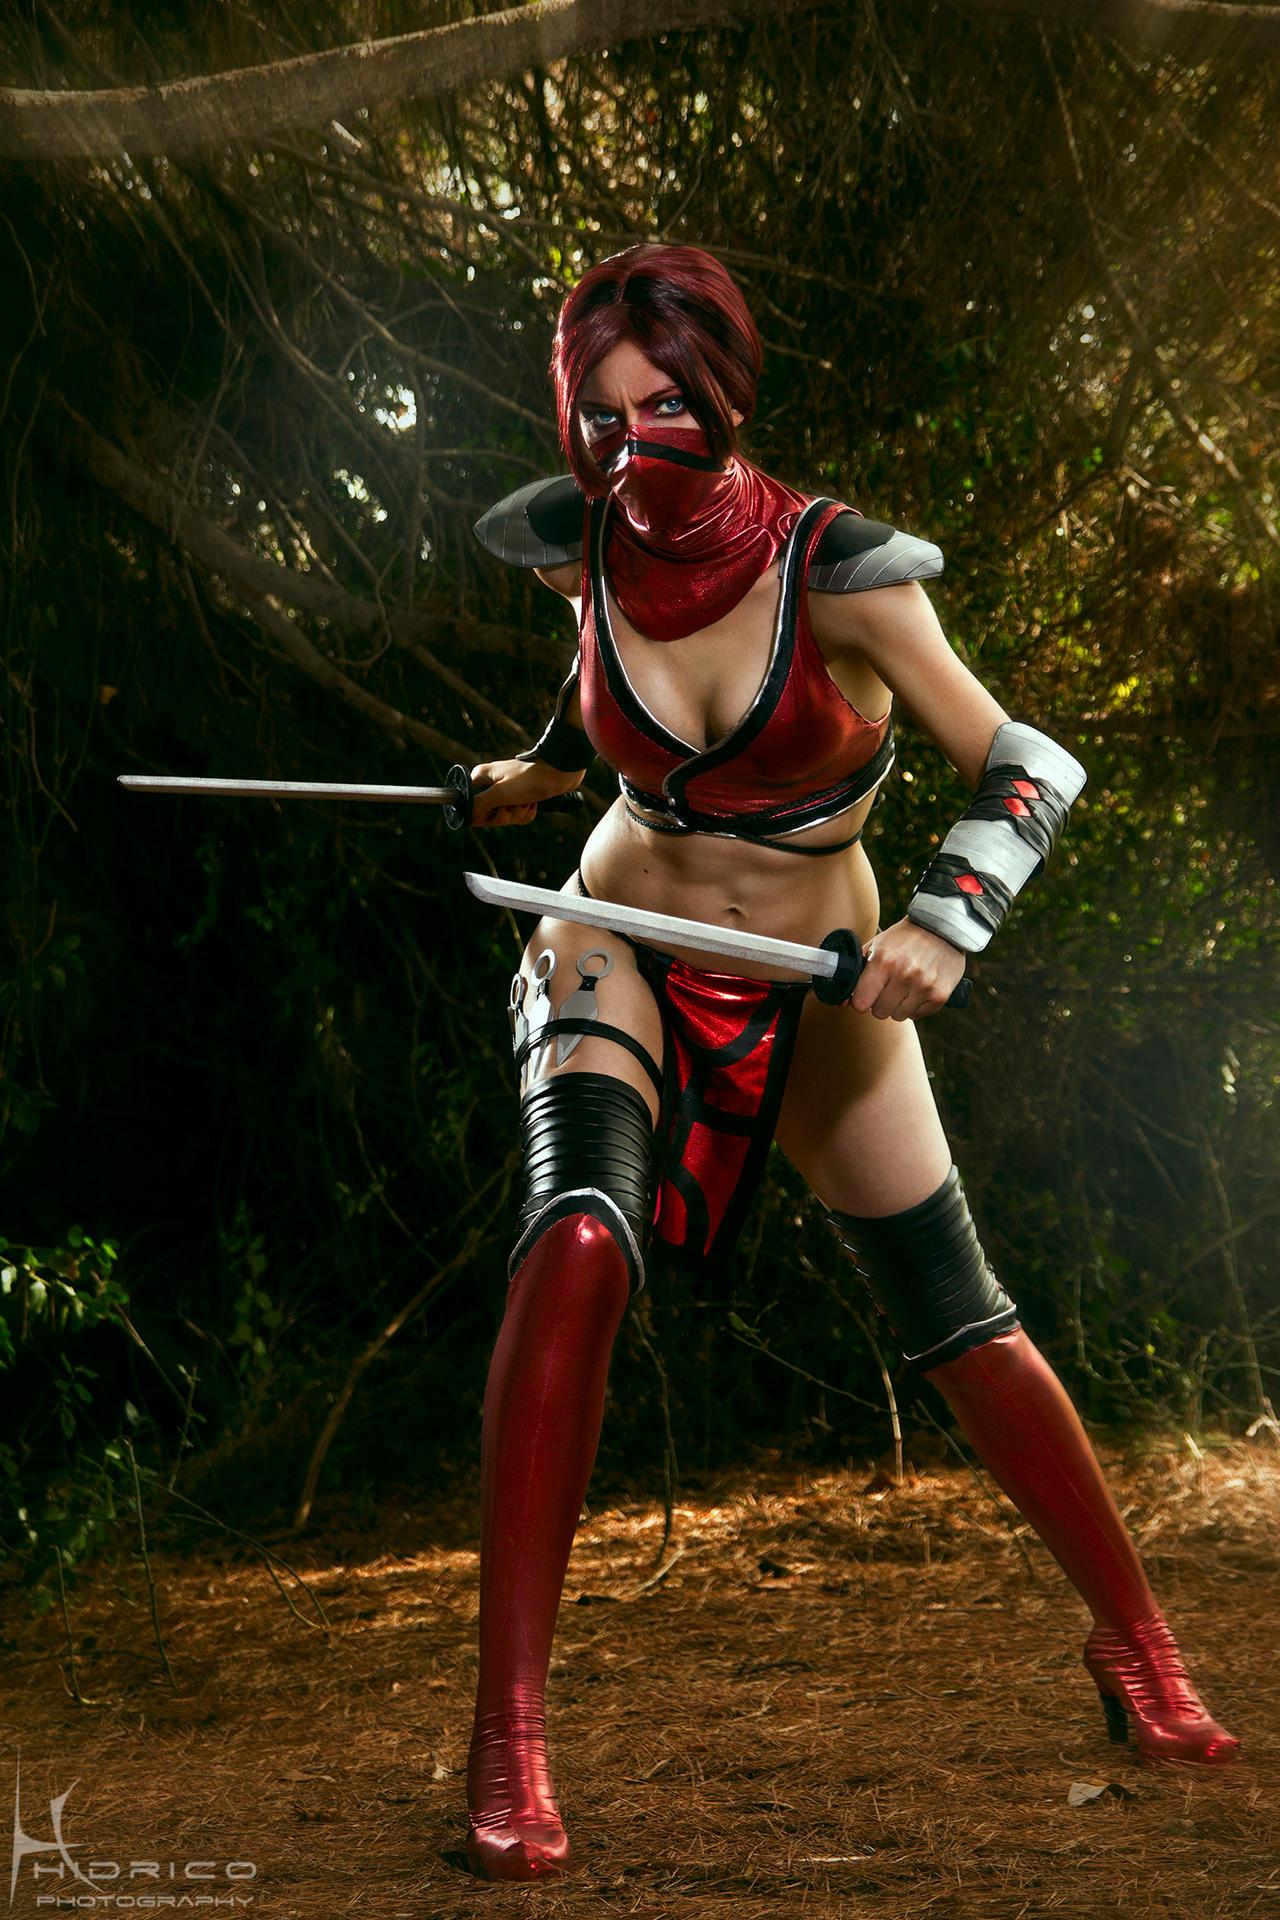 Skarlet - Mortal Kombat 9 - 3 by Hidrico